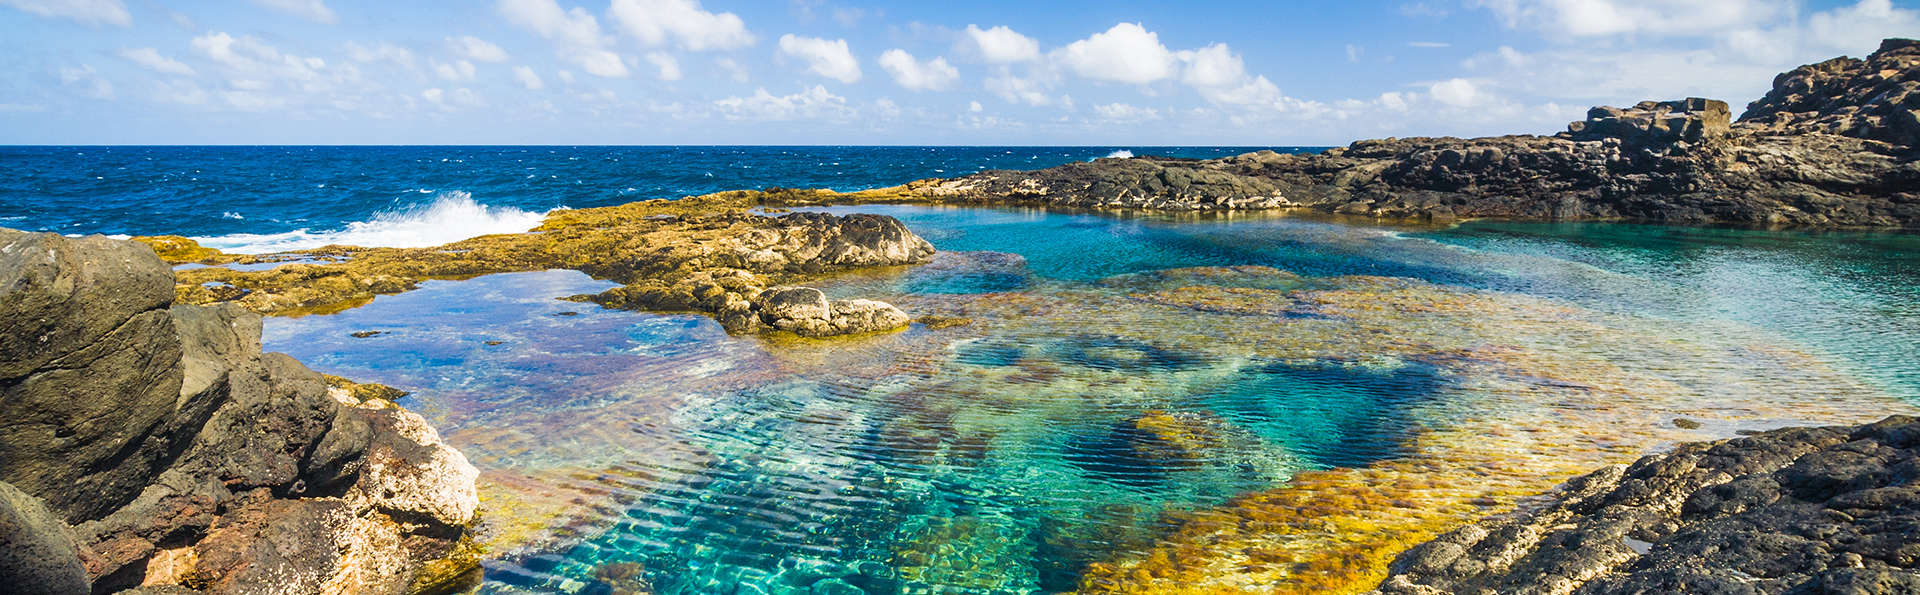 THB Tropical Island  - Edit_Lanzarote2.jpg